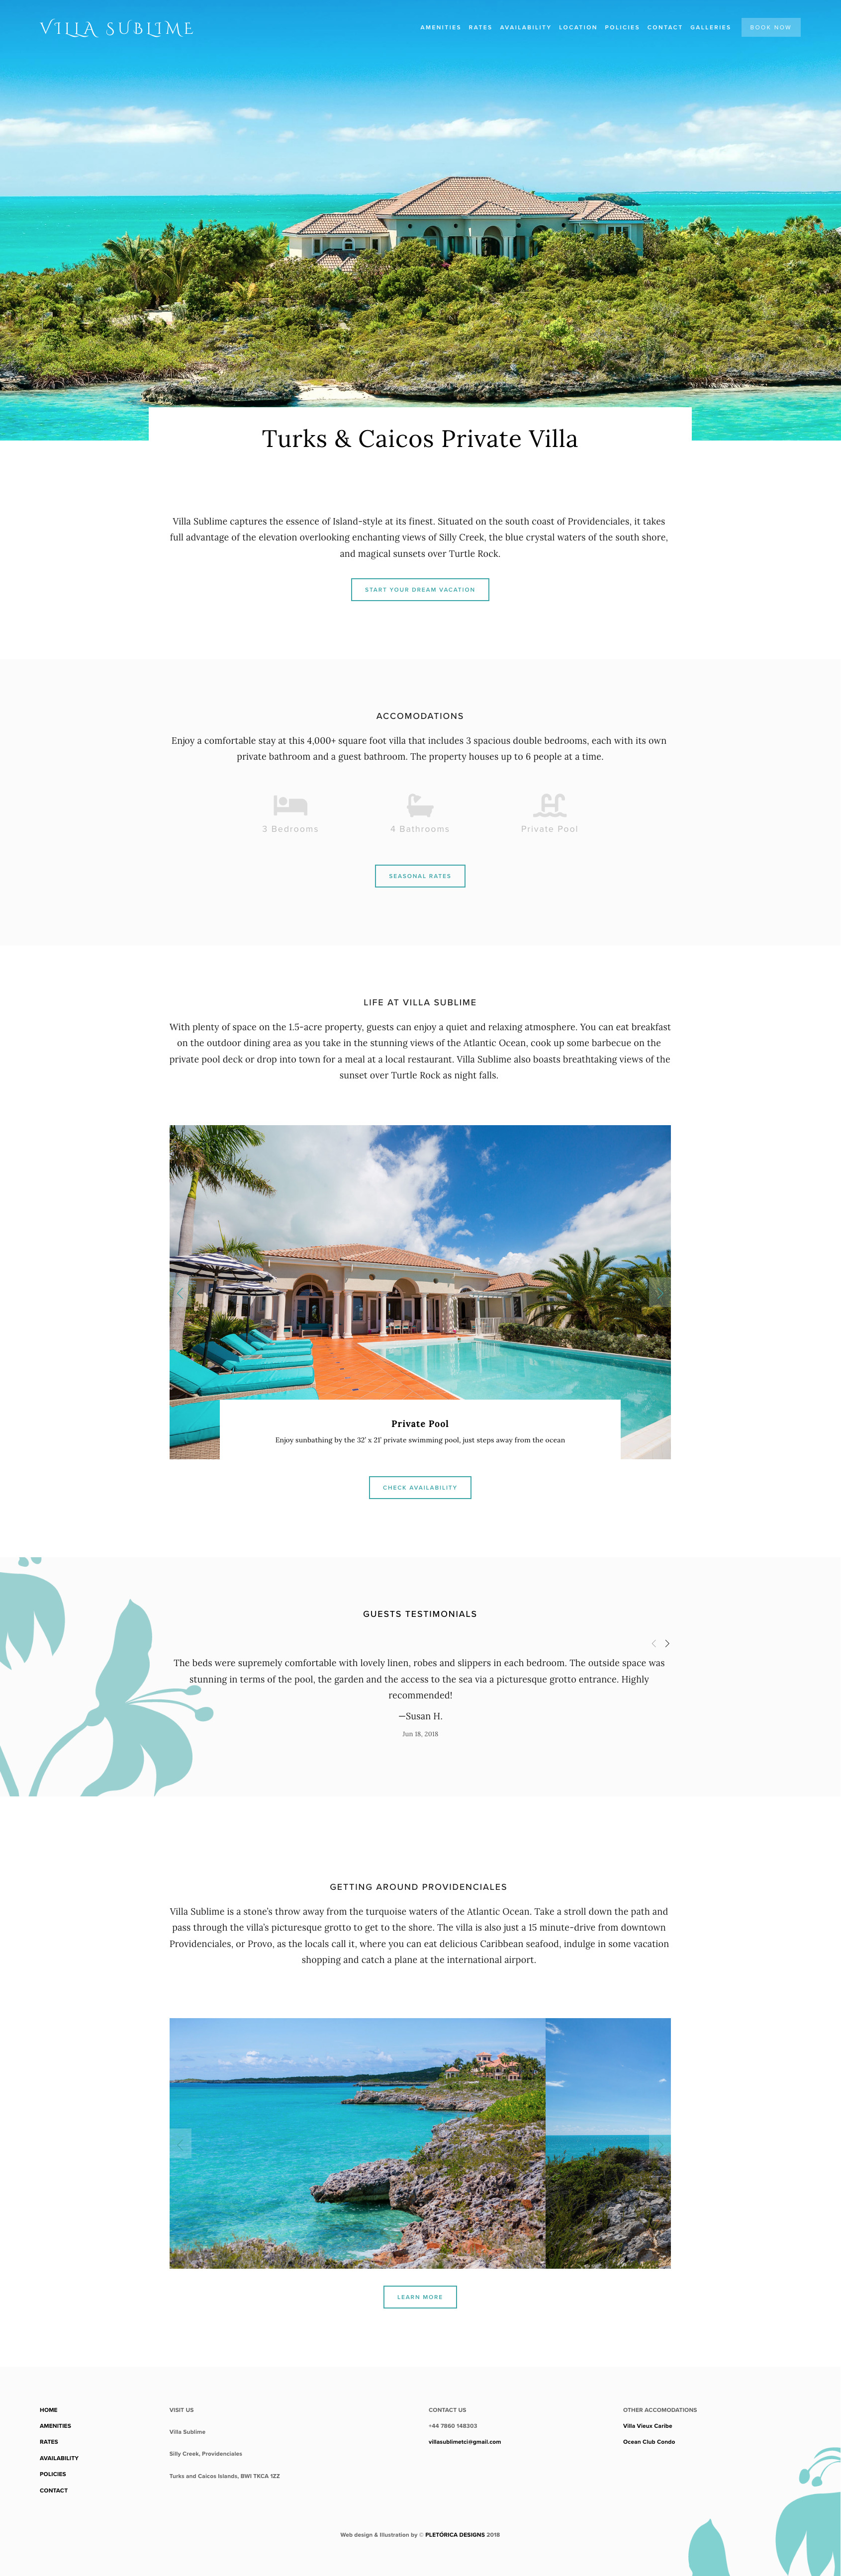 Villa Sublime Squarespace Website — PLETÓRICA DESIGNS